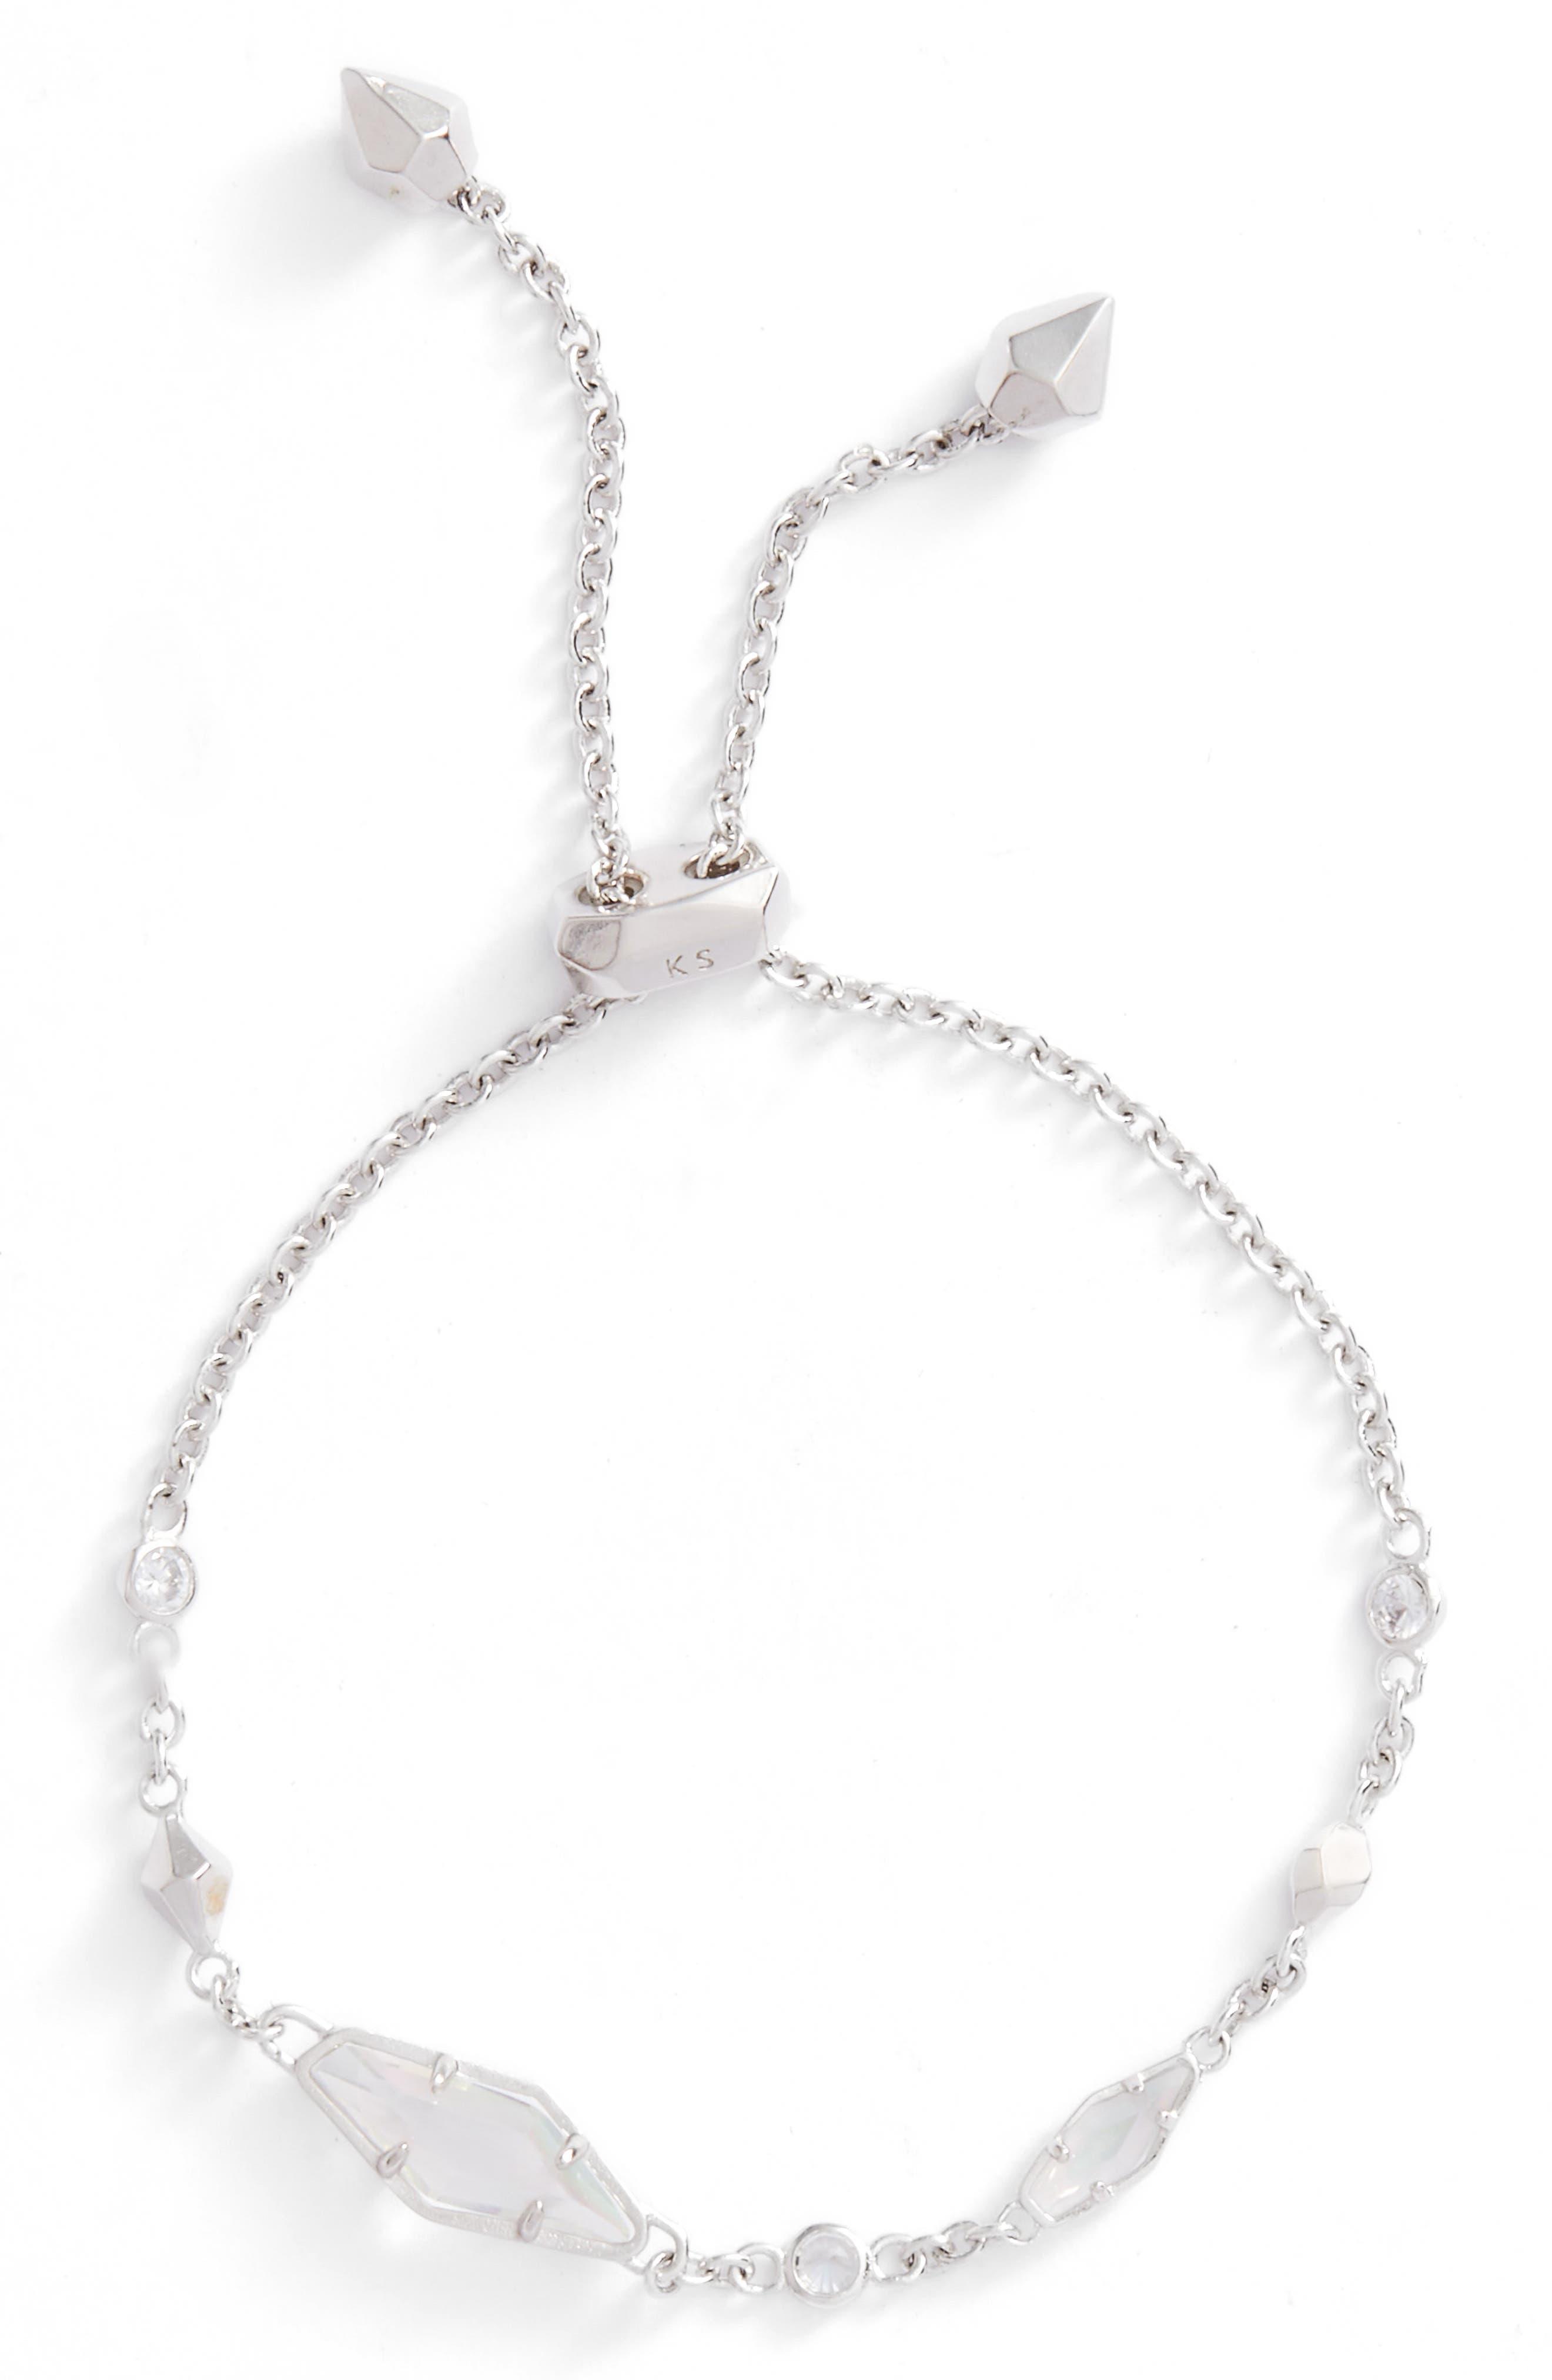 Kendra Scott Deb Friendship Bracelet